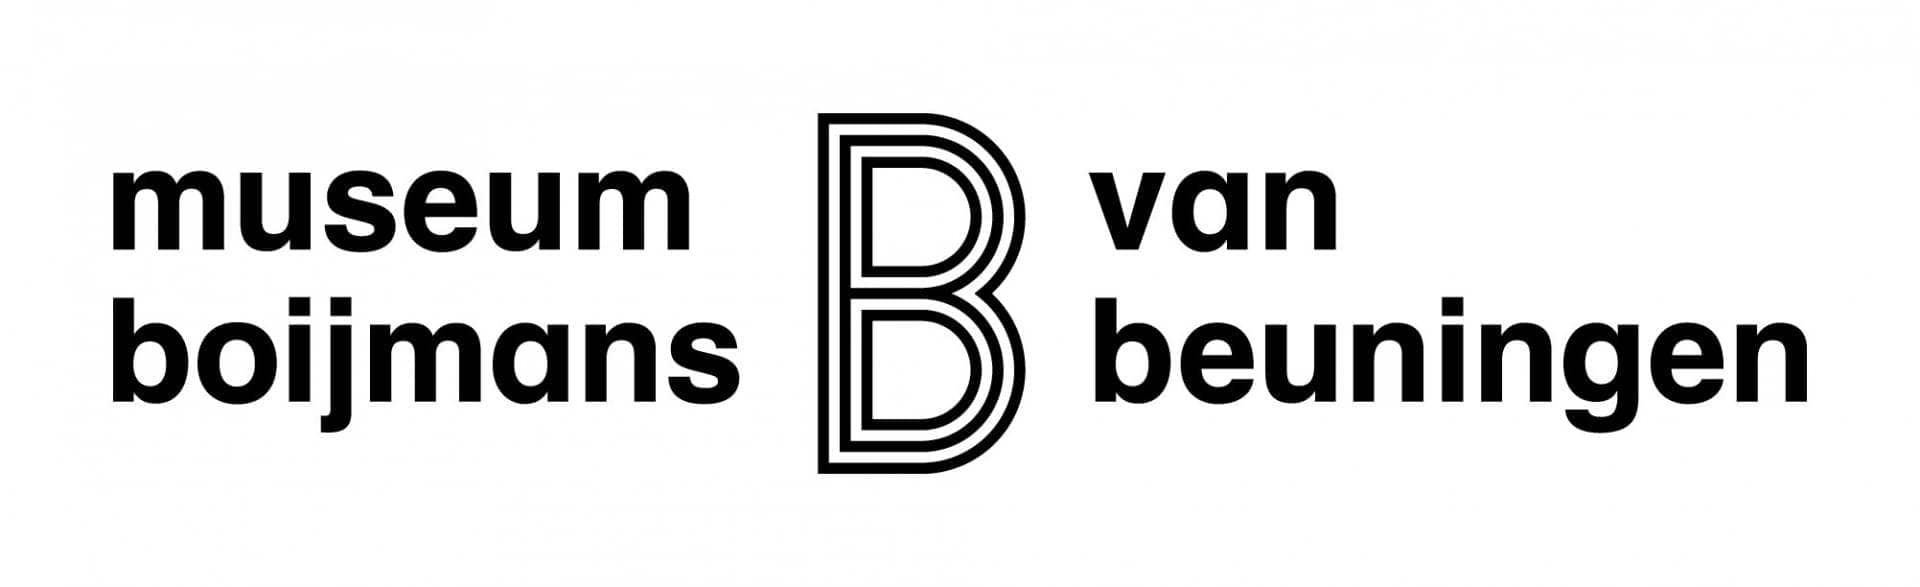 boijmans-sponsorlogo.jpg